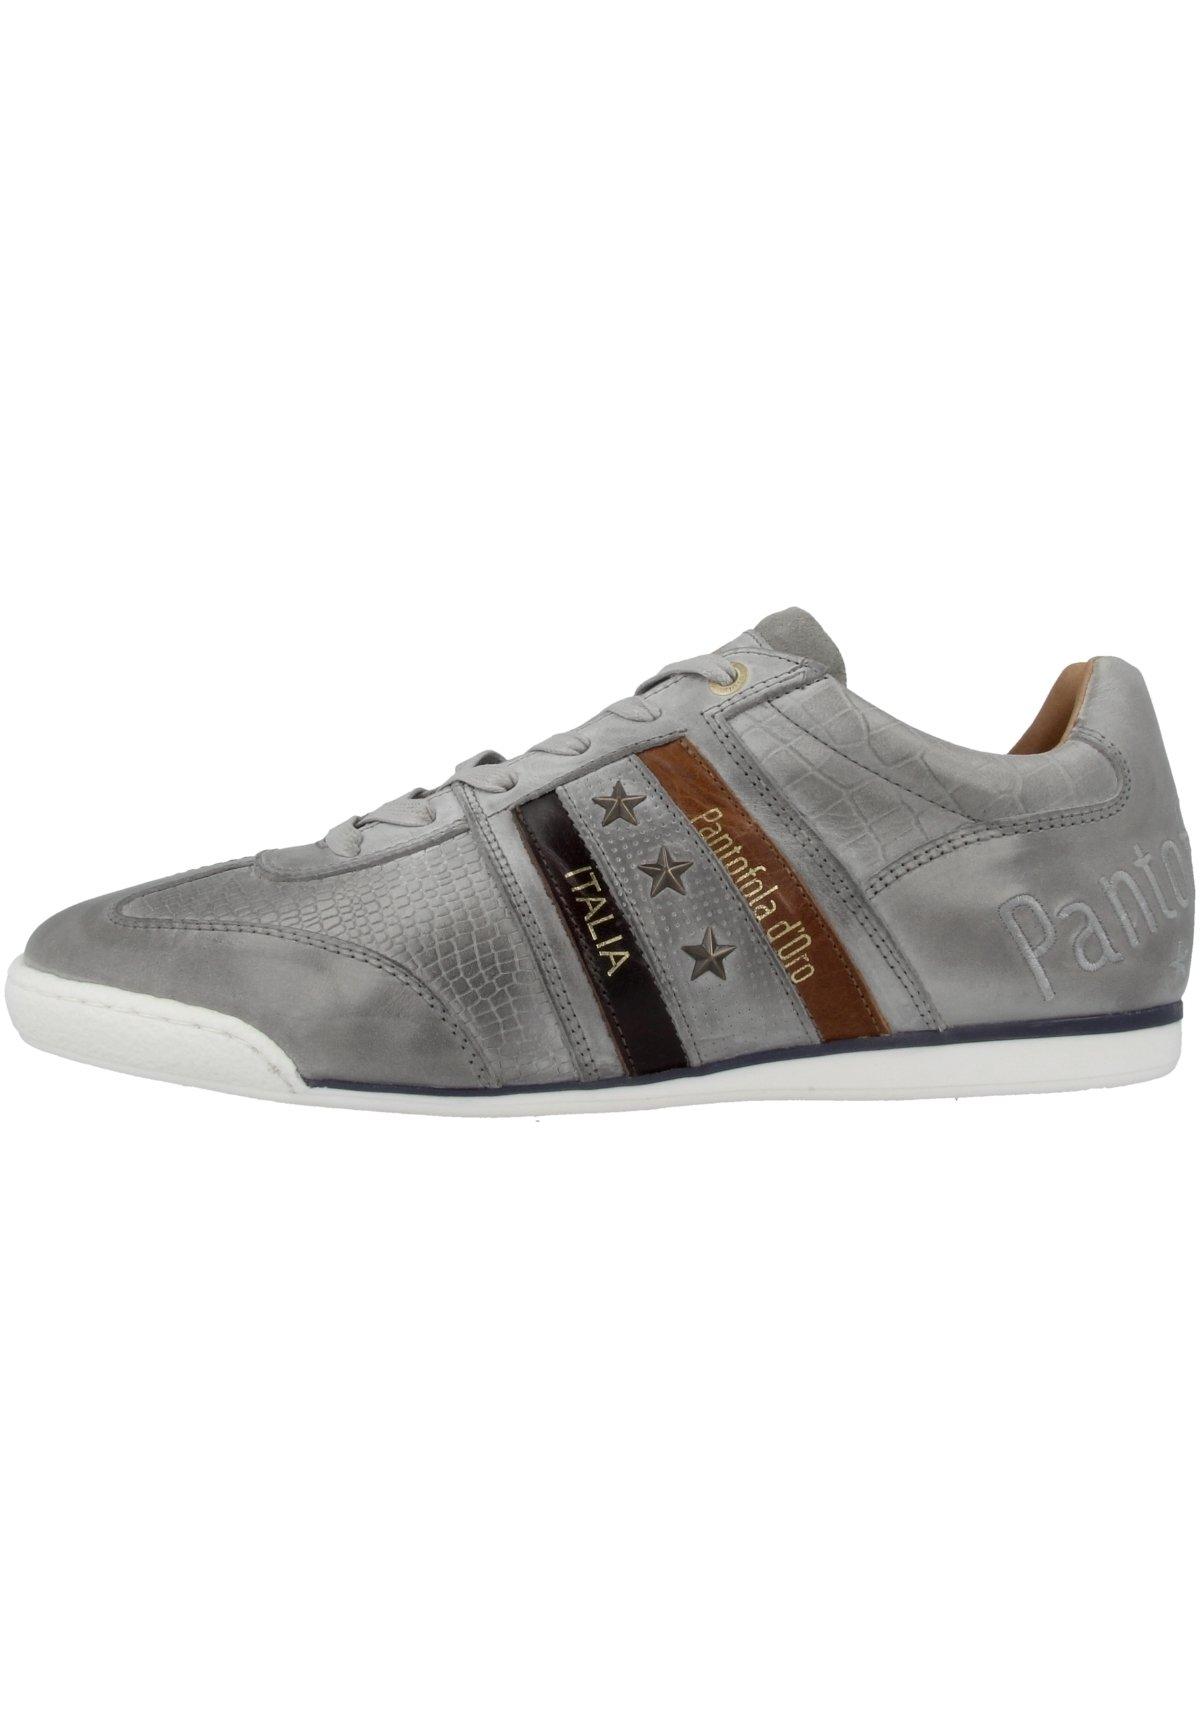 Homme IMOLA  - Chaussures à lacets